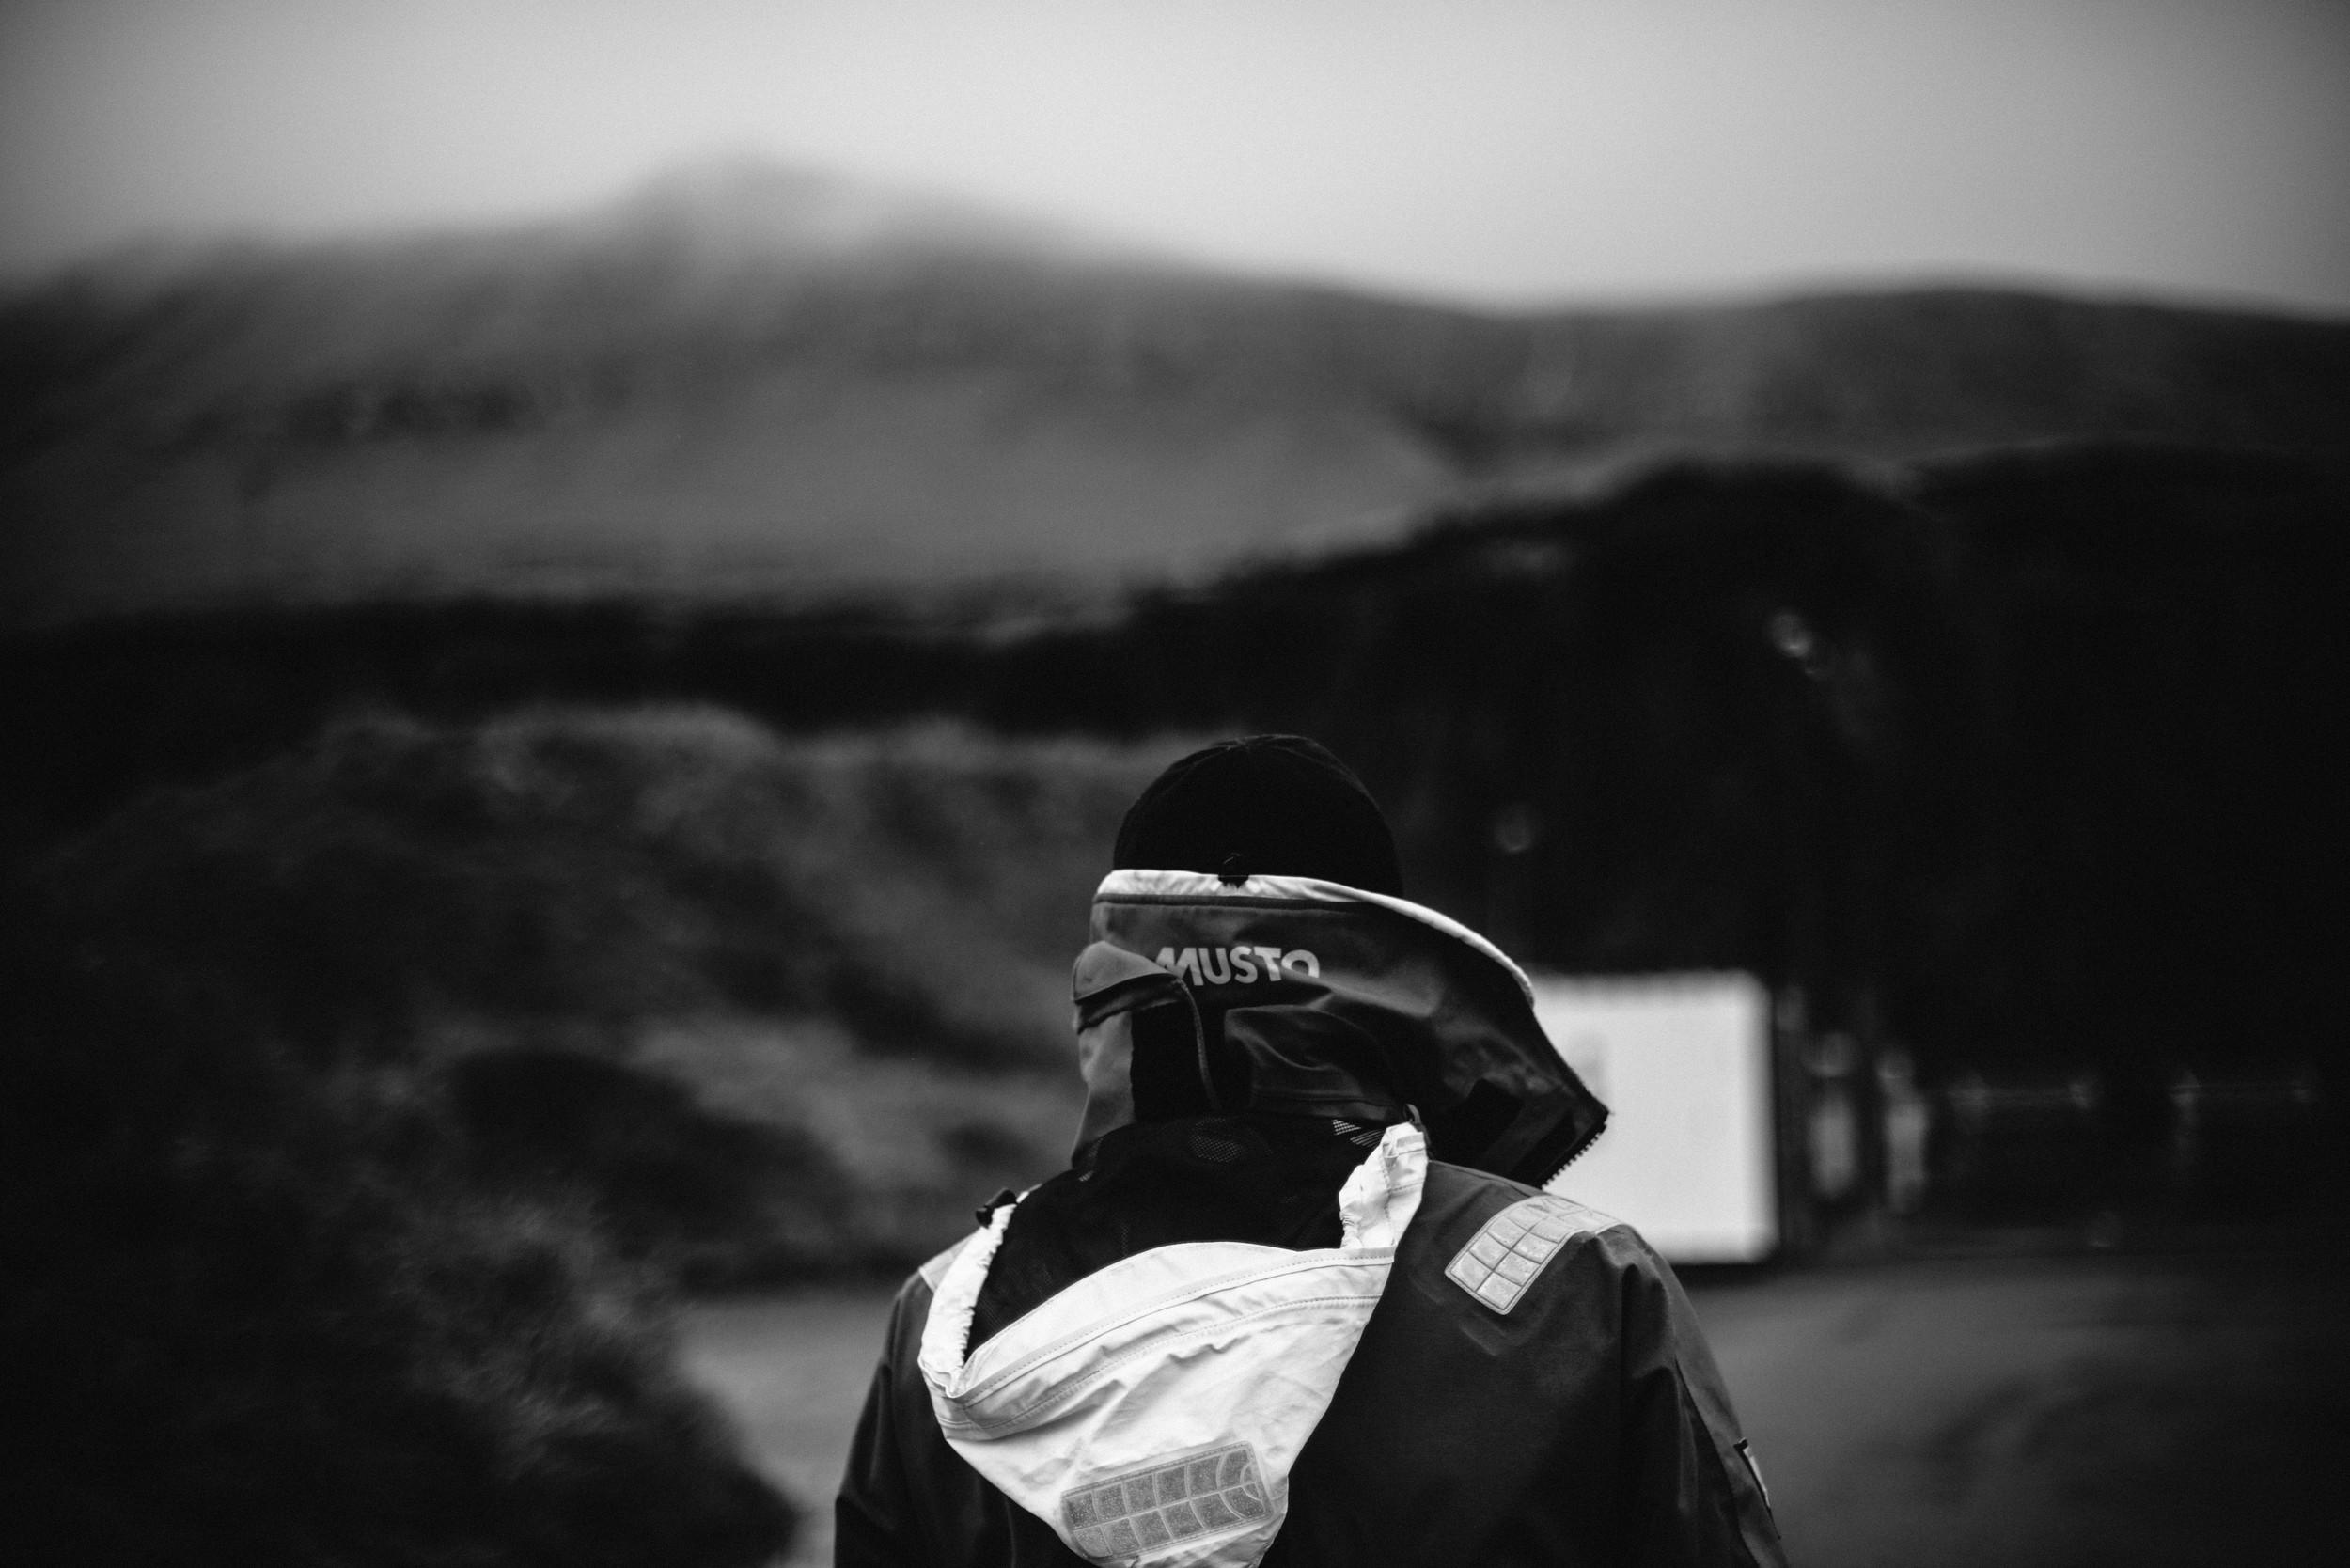 Faroes_Torshavn_1-6296.jpg